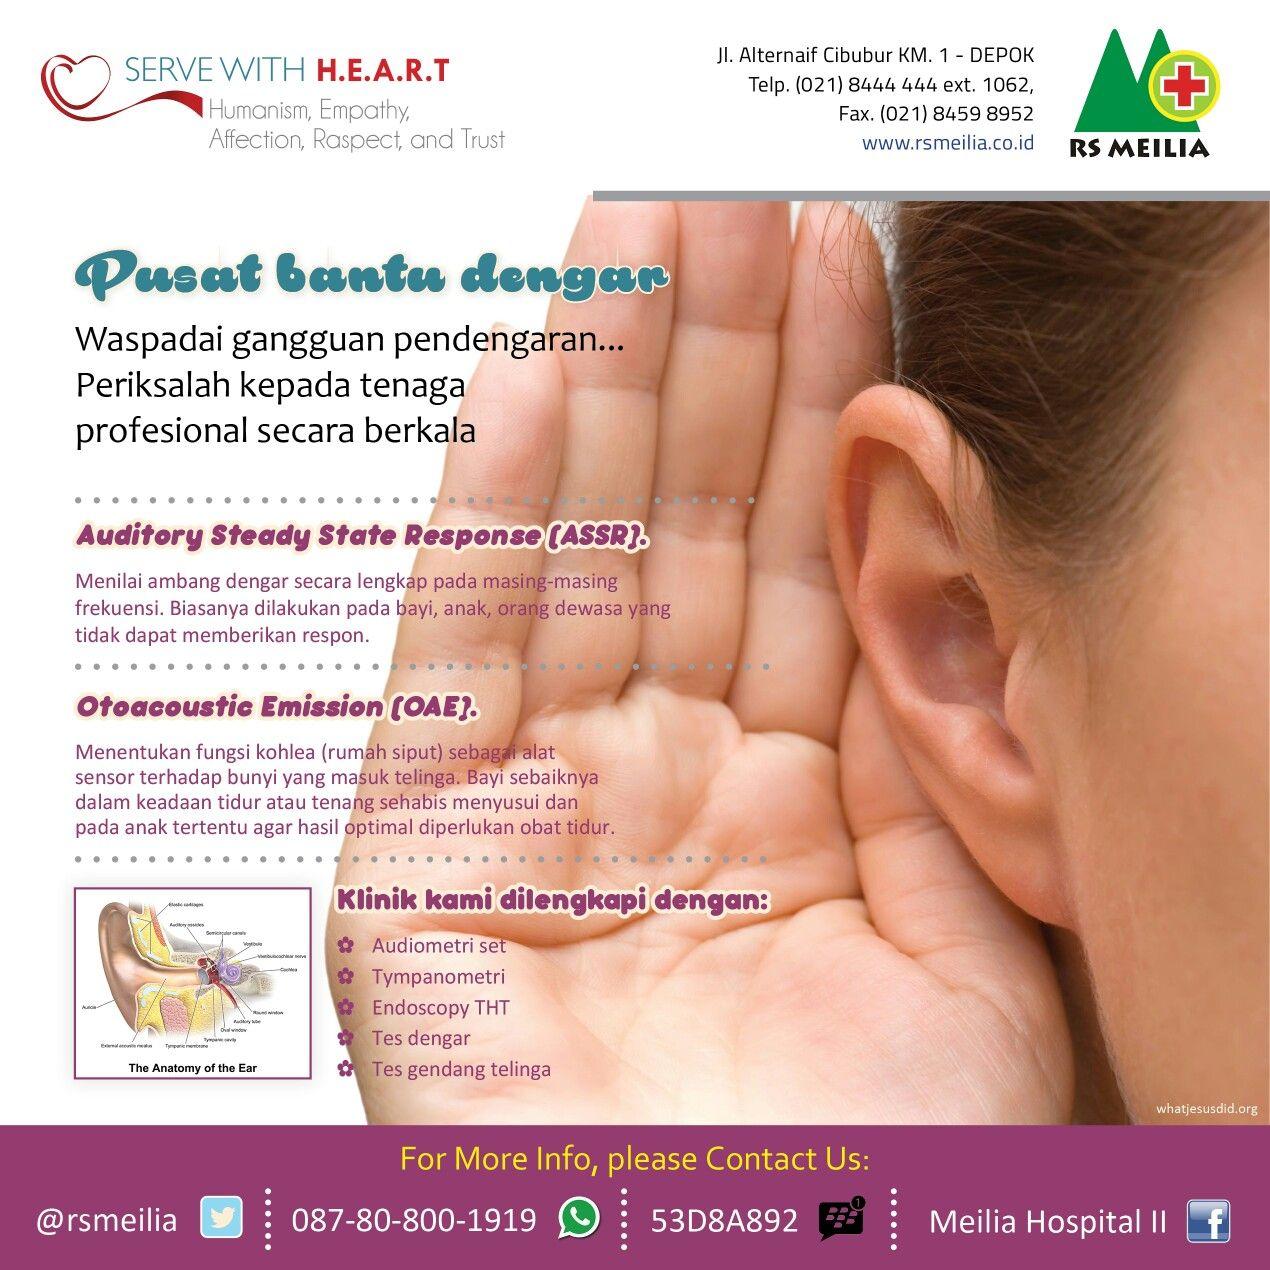 Klinik Dengar Pendengaran Tht Telinga Layanan Kesehatan Alat Bantu Jakarta Dokter